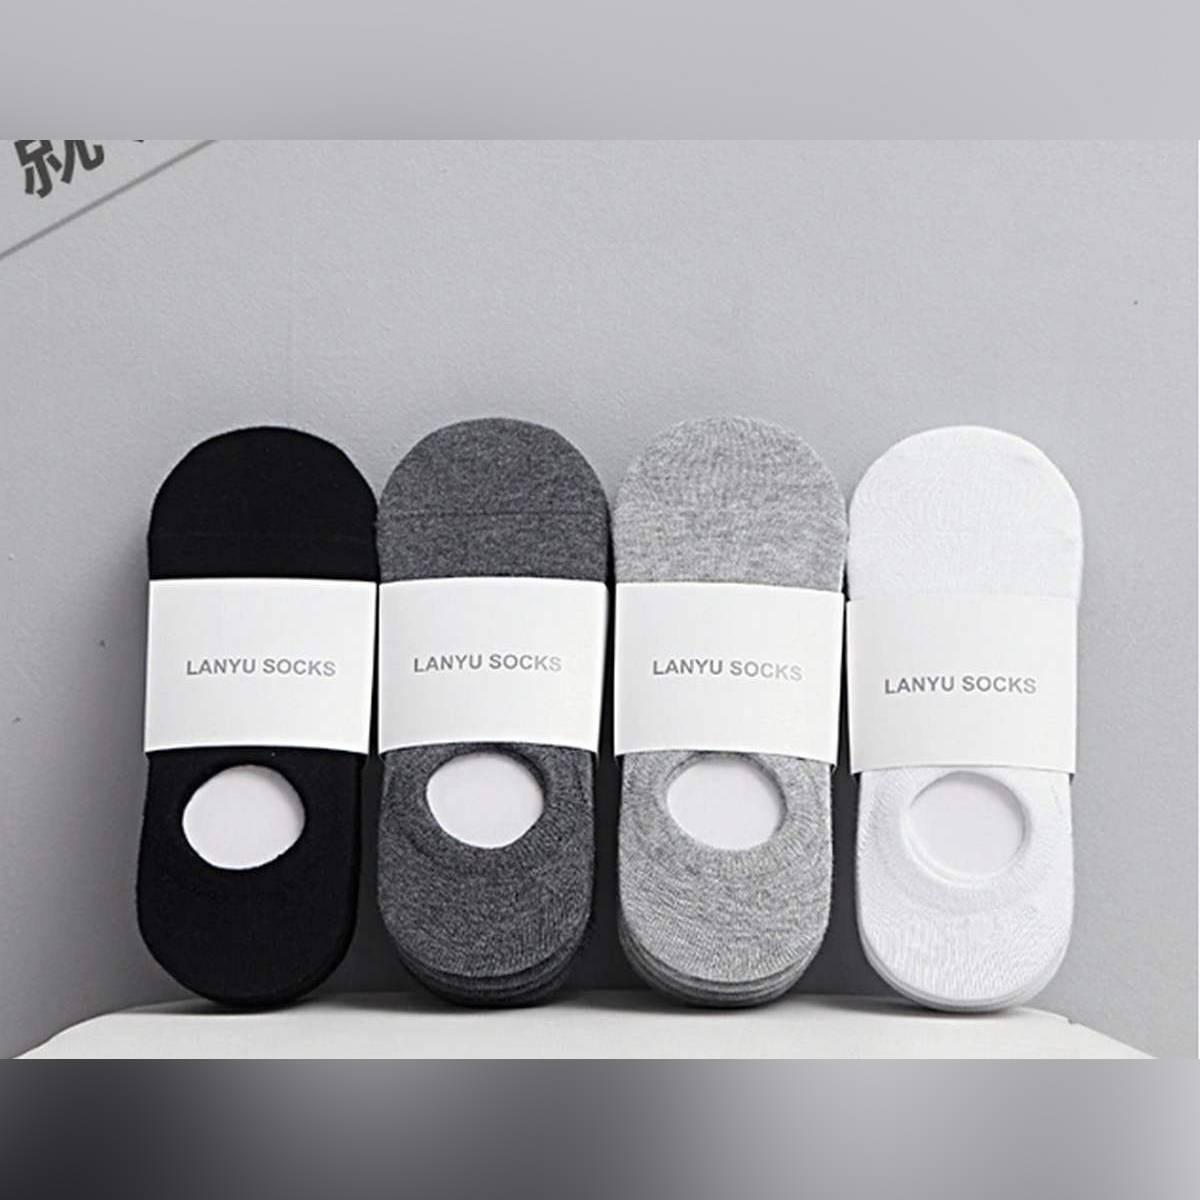 PAIR of 3 - Socks Low Cut ankle socks for Men and Women